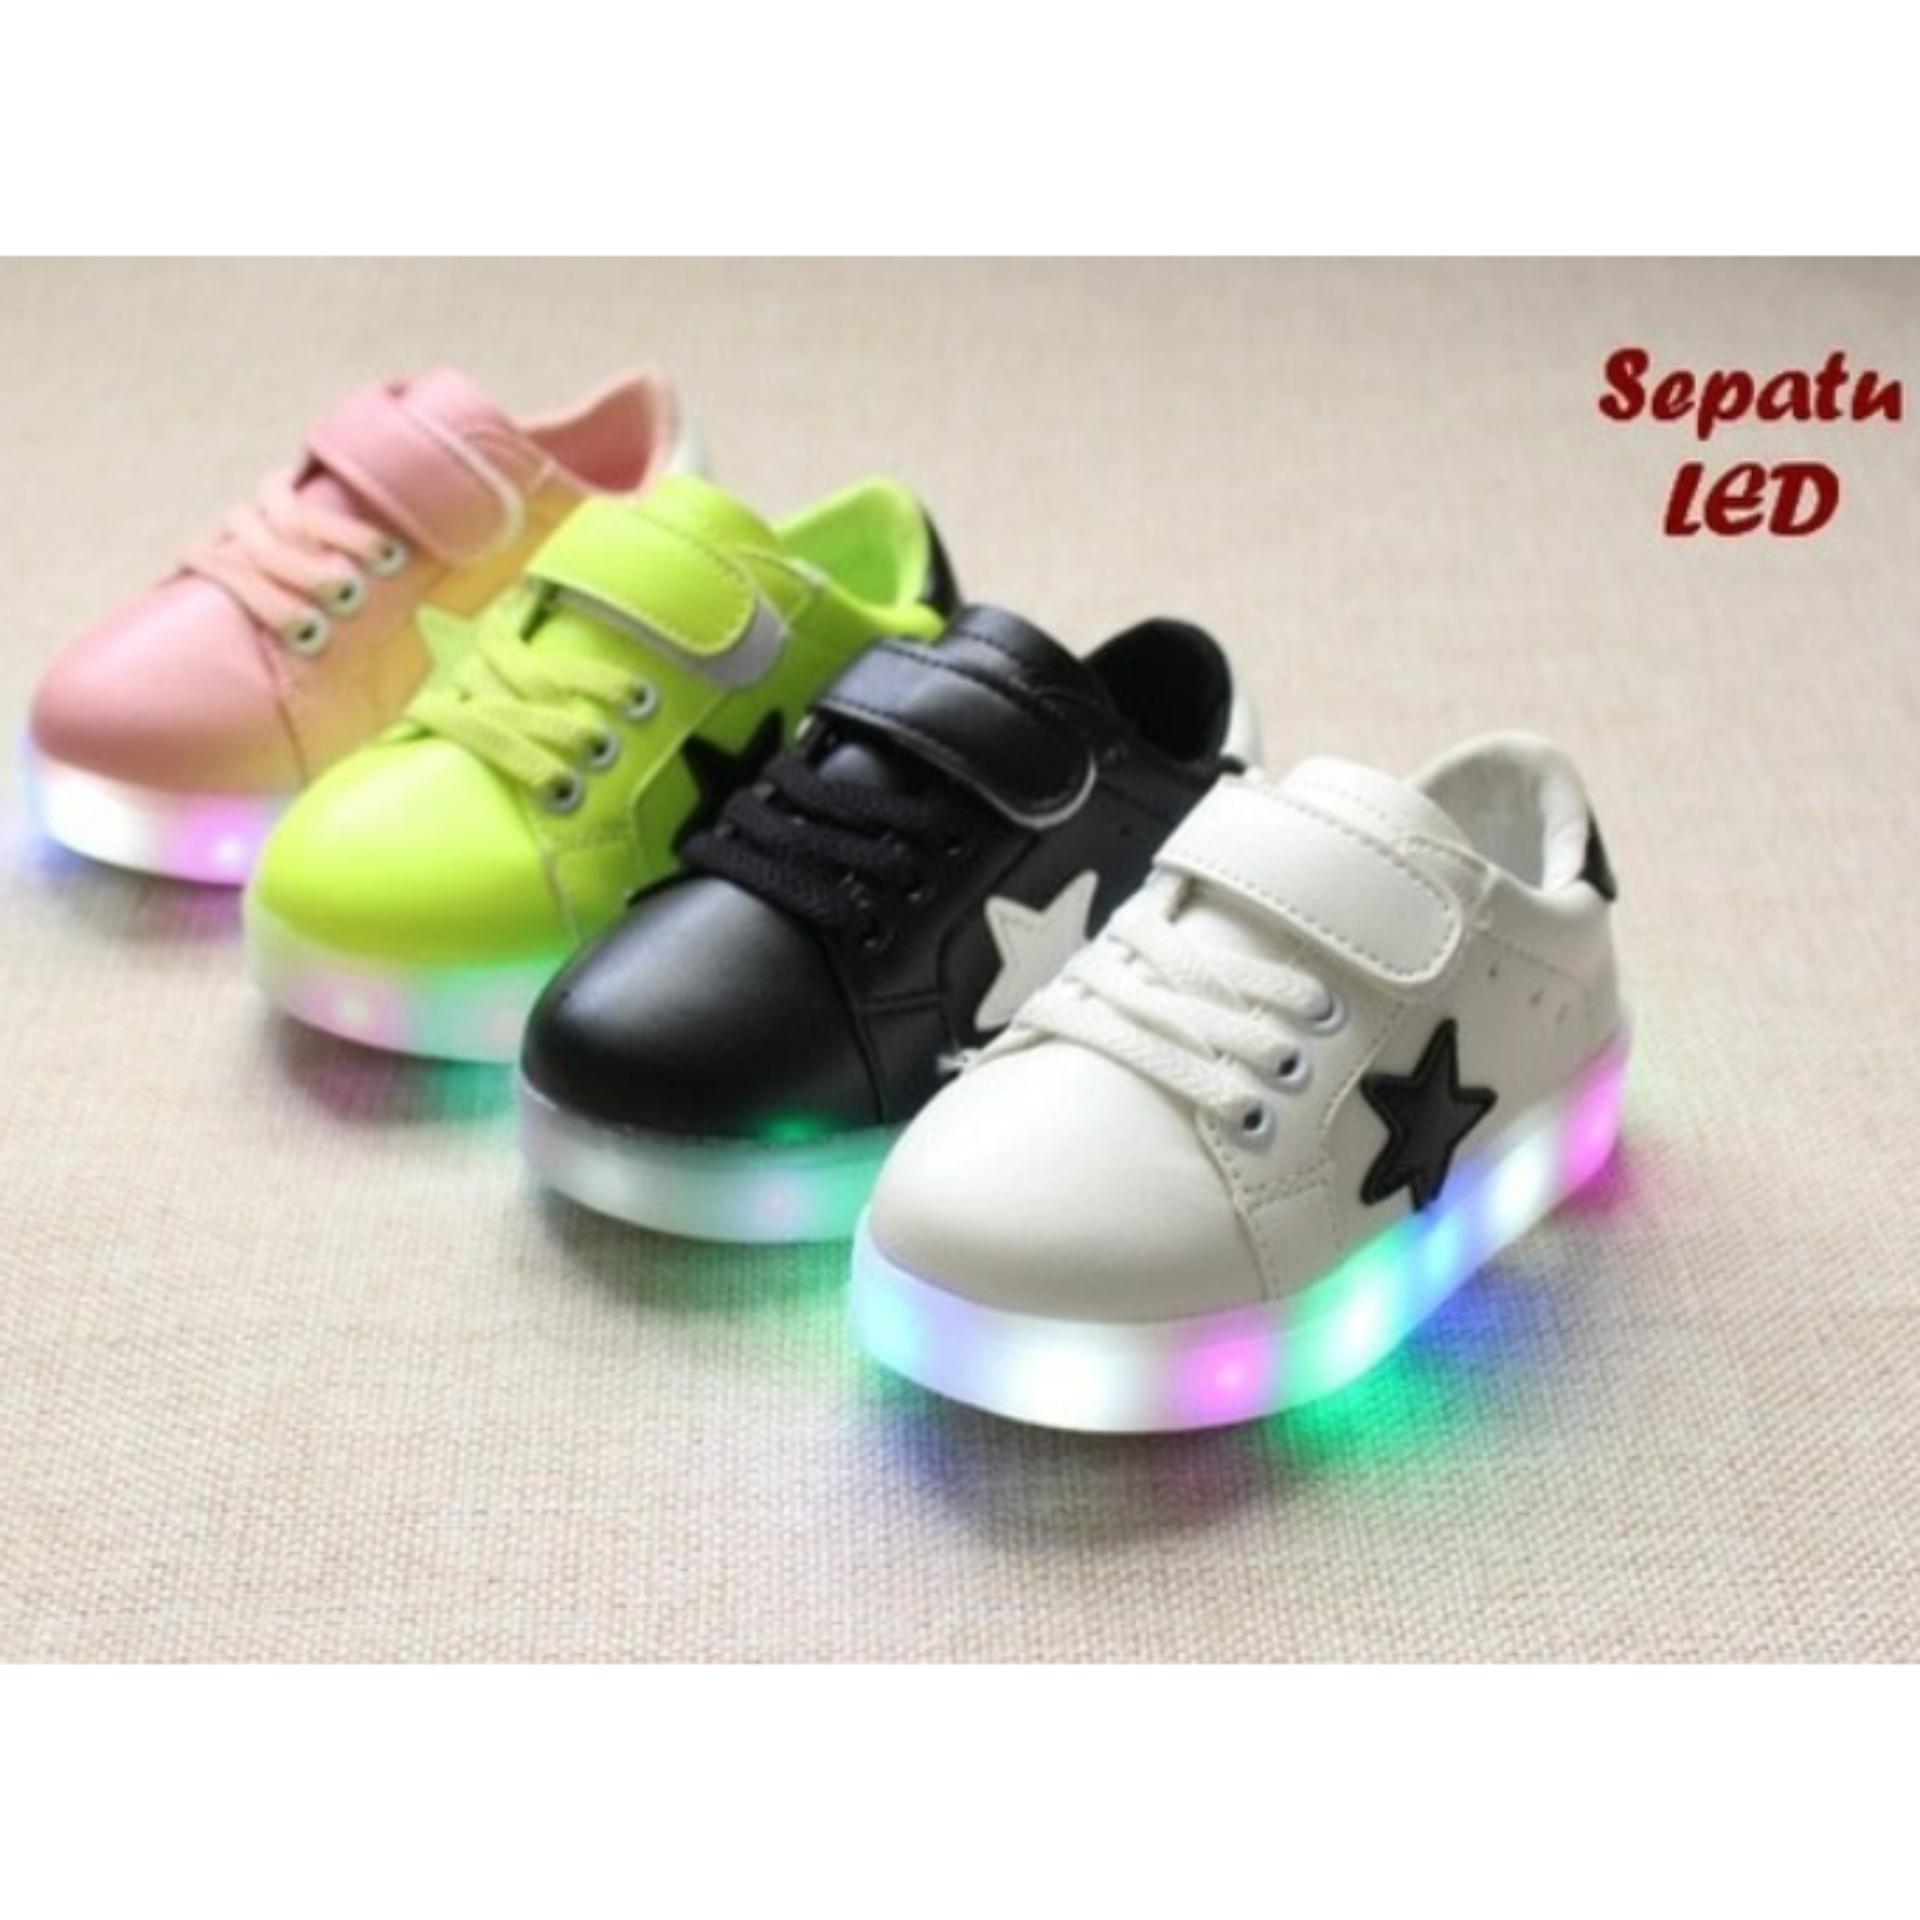 Cek Harga Baru Sepatu Sport Anak Glitter Warna Gold Lampu Nyala Led Korek Kuping Keren Dengan Warni